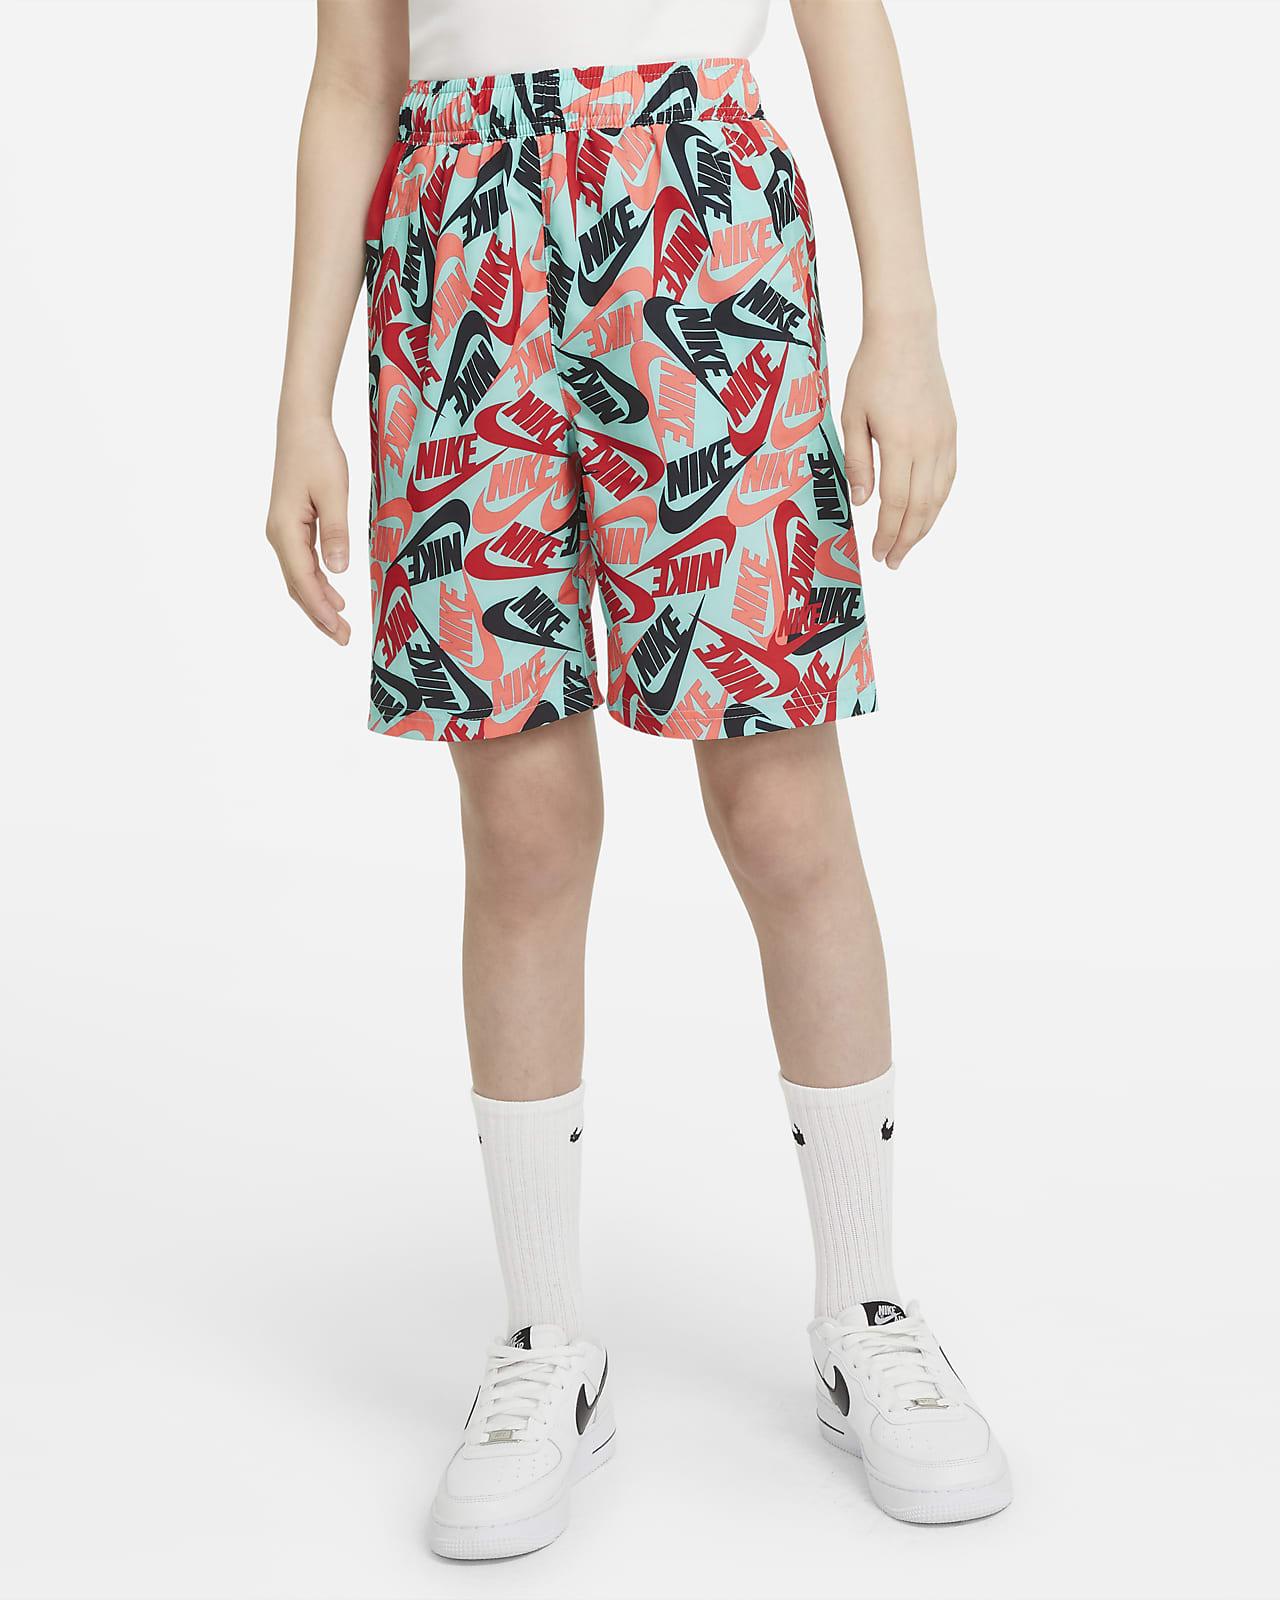 Nike Sportswear Big Kids' (Boys') Printed Woven Shorts